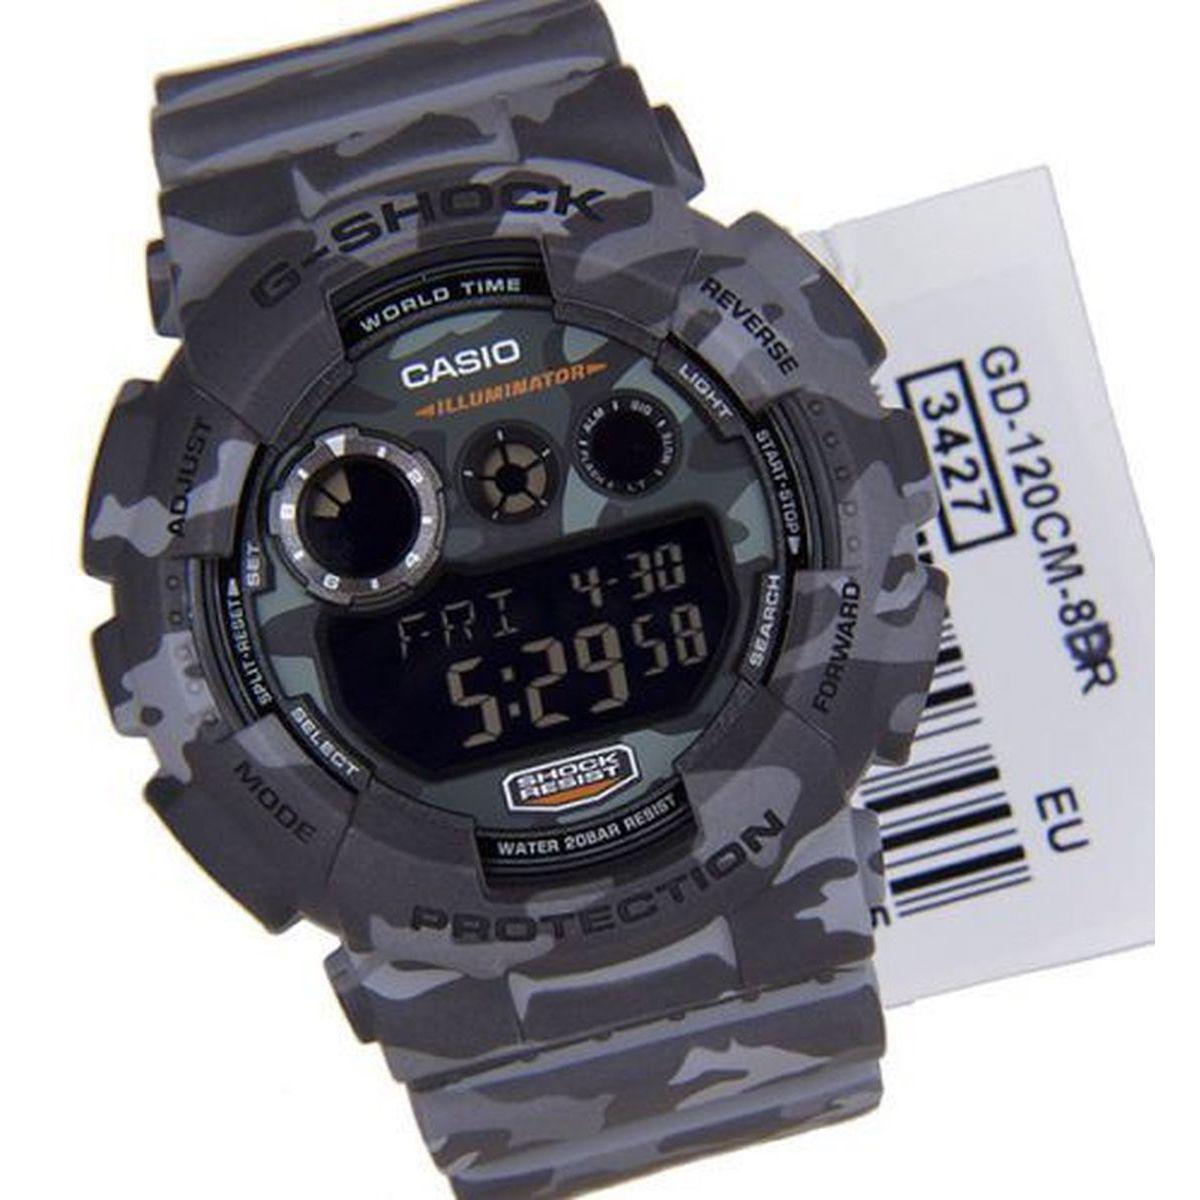 133c72db09b Relogio Masculino Casio G-shock Anadigi Gd-120cm-8dr - Camuflado R  649